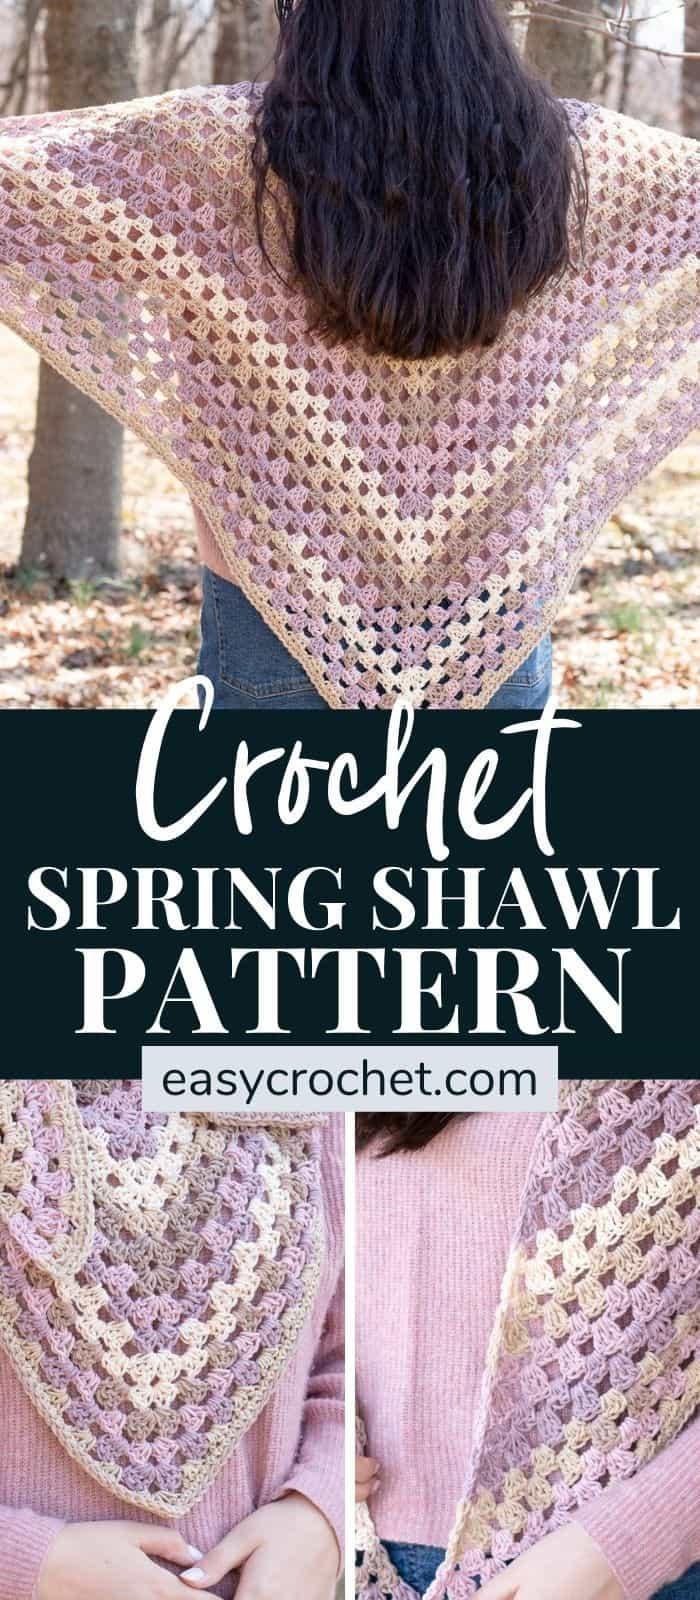 Easy Crochet Shawl Pattern for Spring via @easycrochetcom